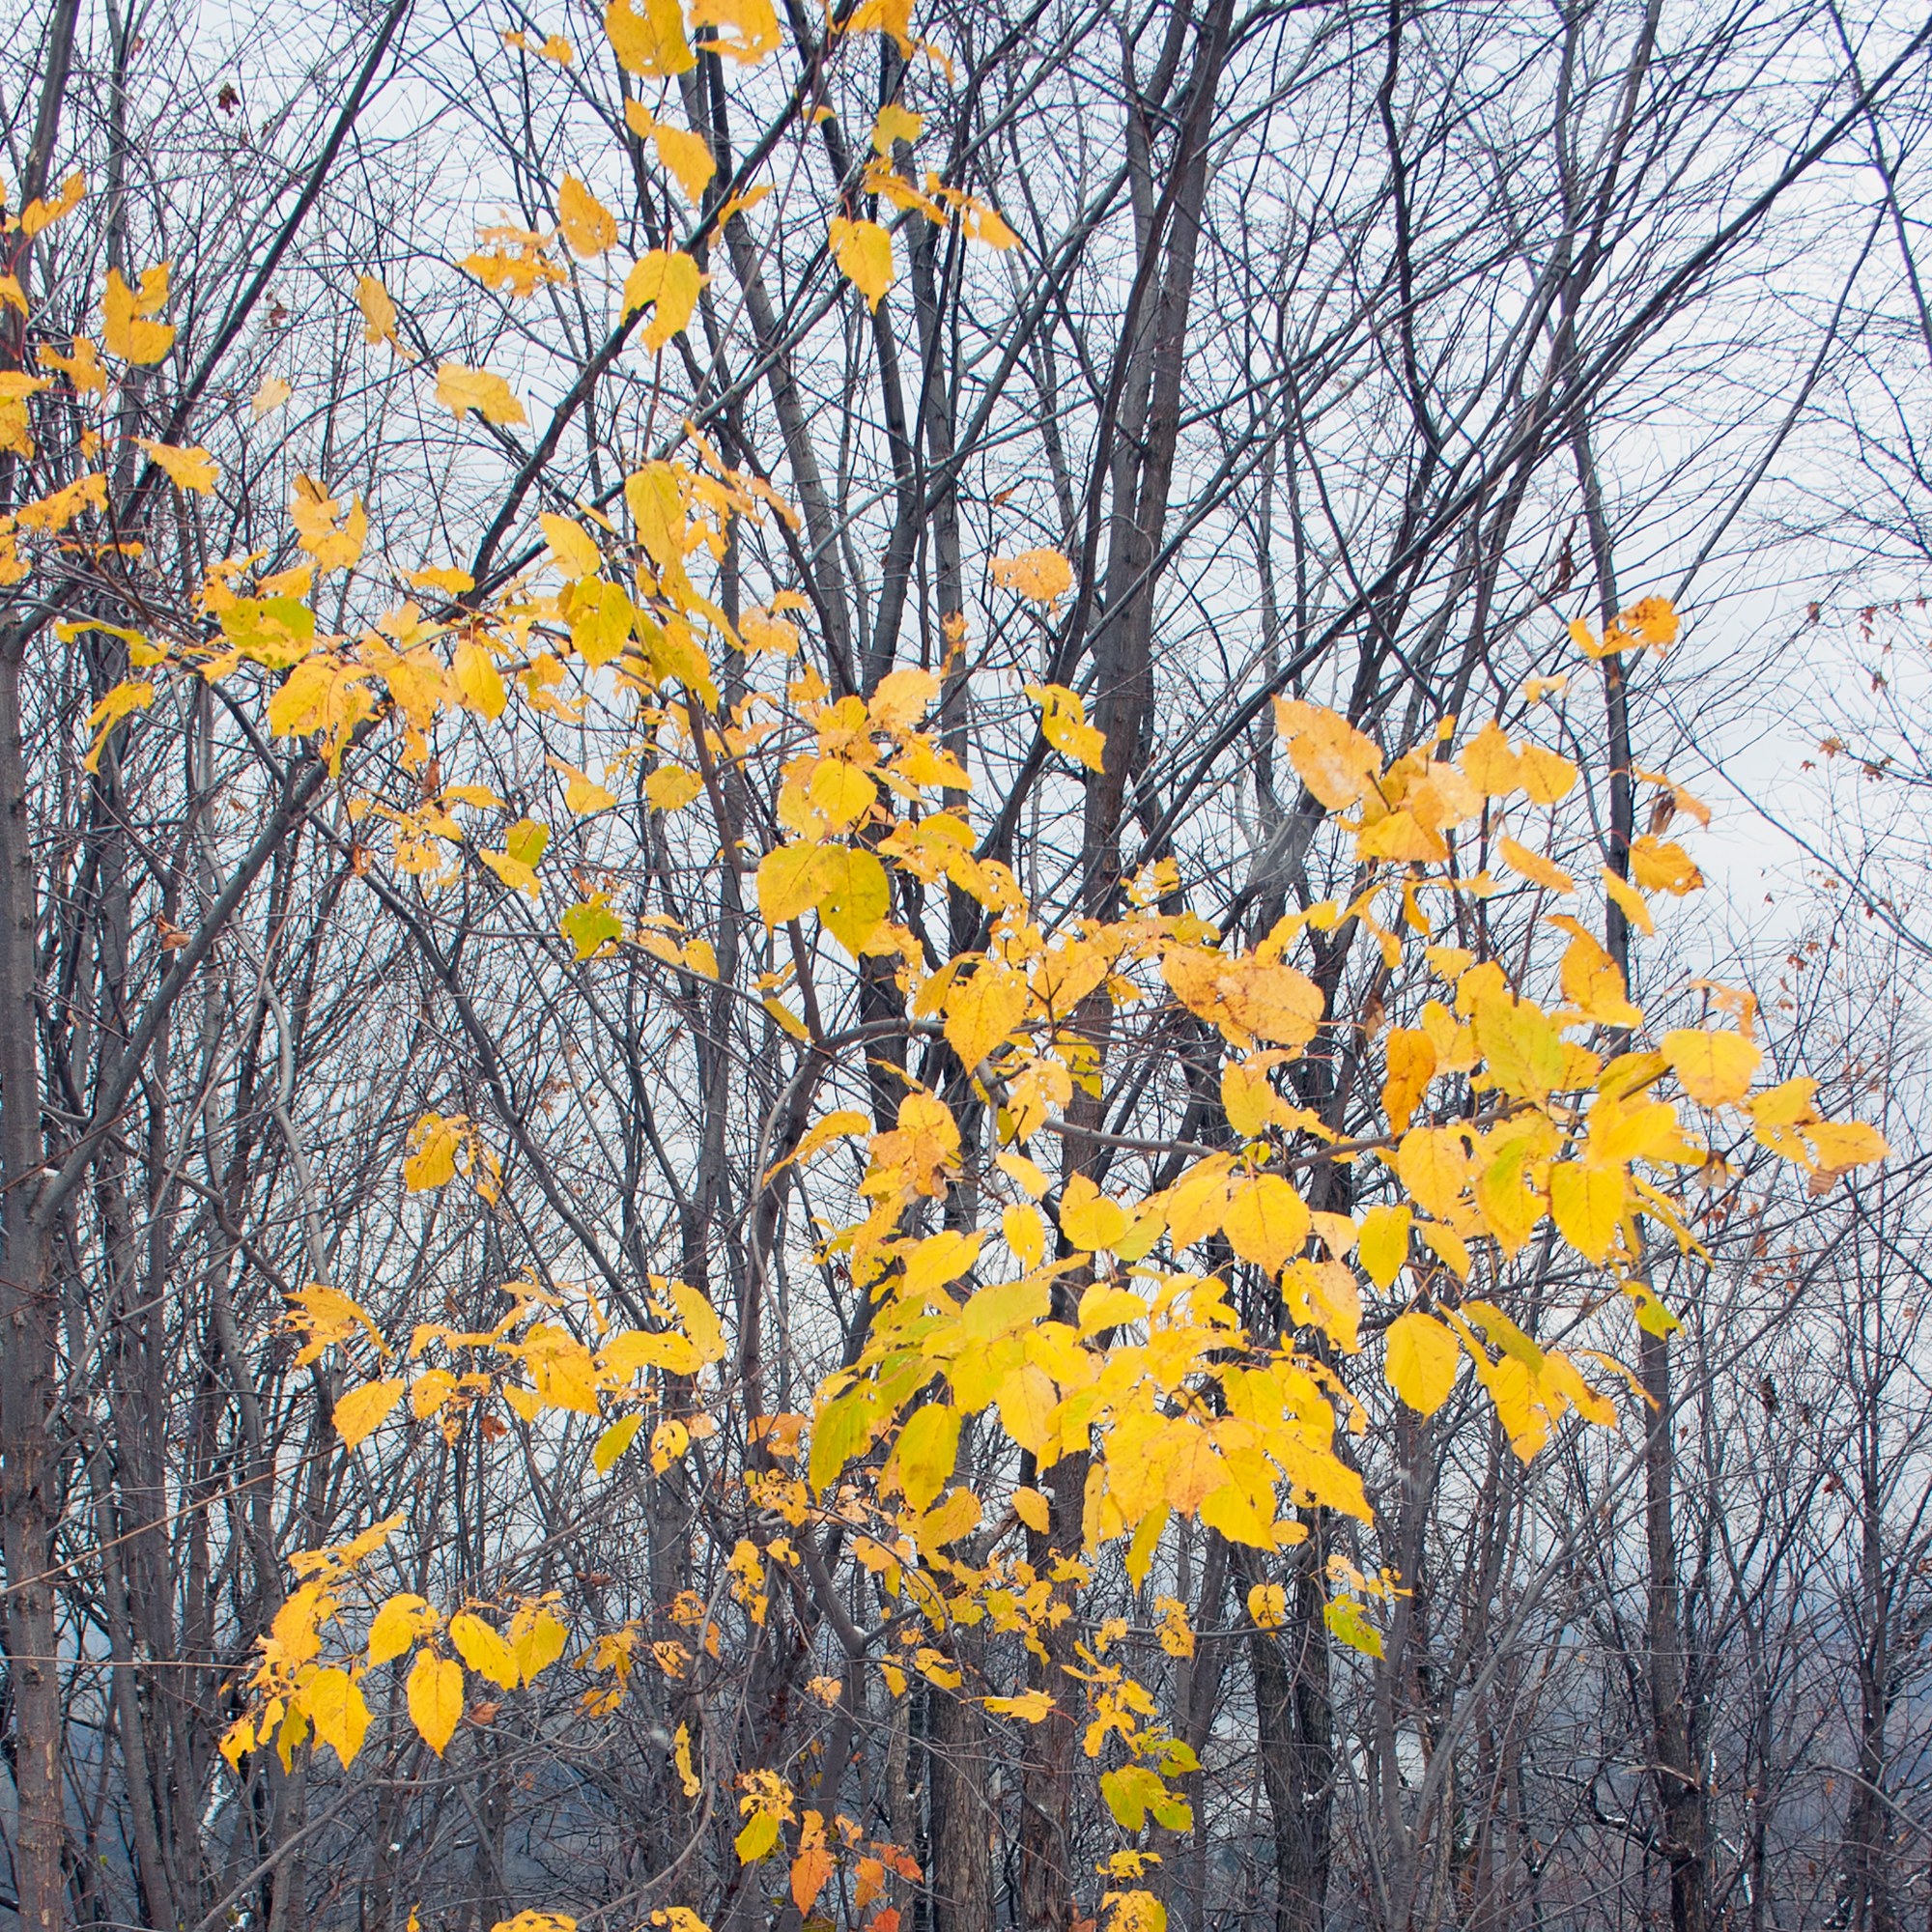 leaves, Wood, Yellow, Winter, Tree, HQ Photo